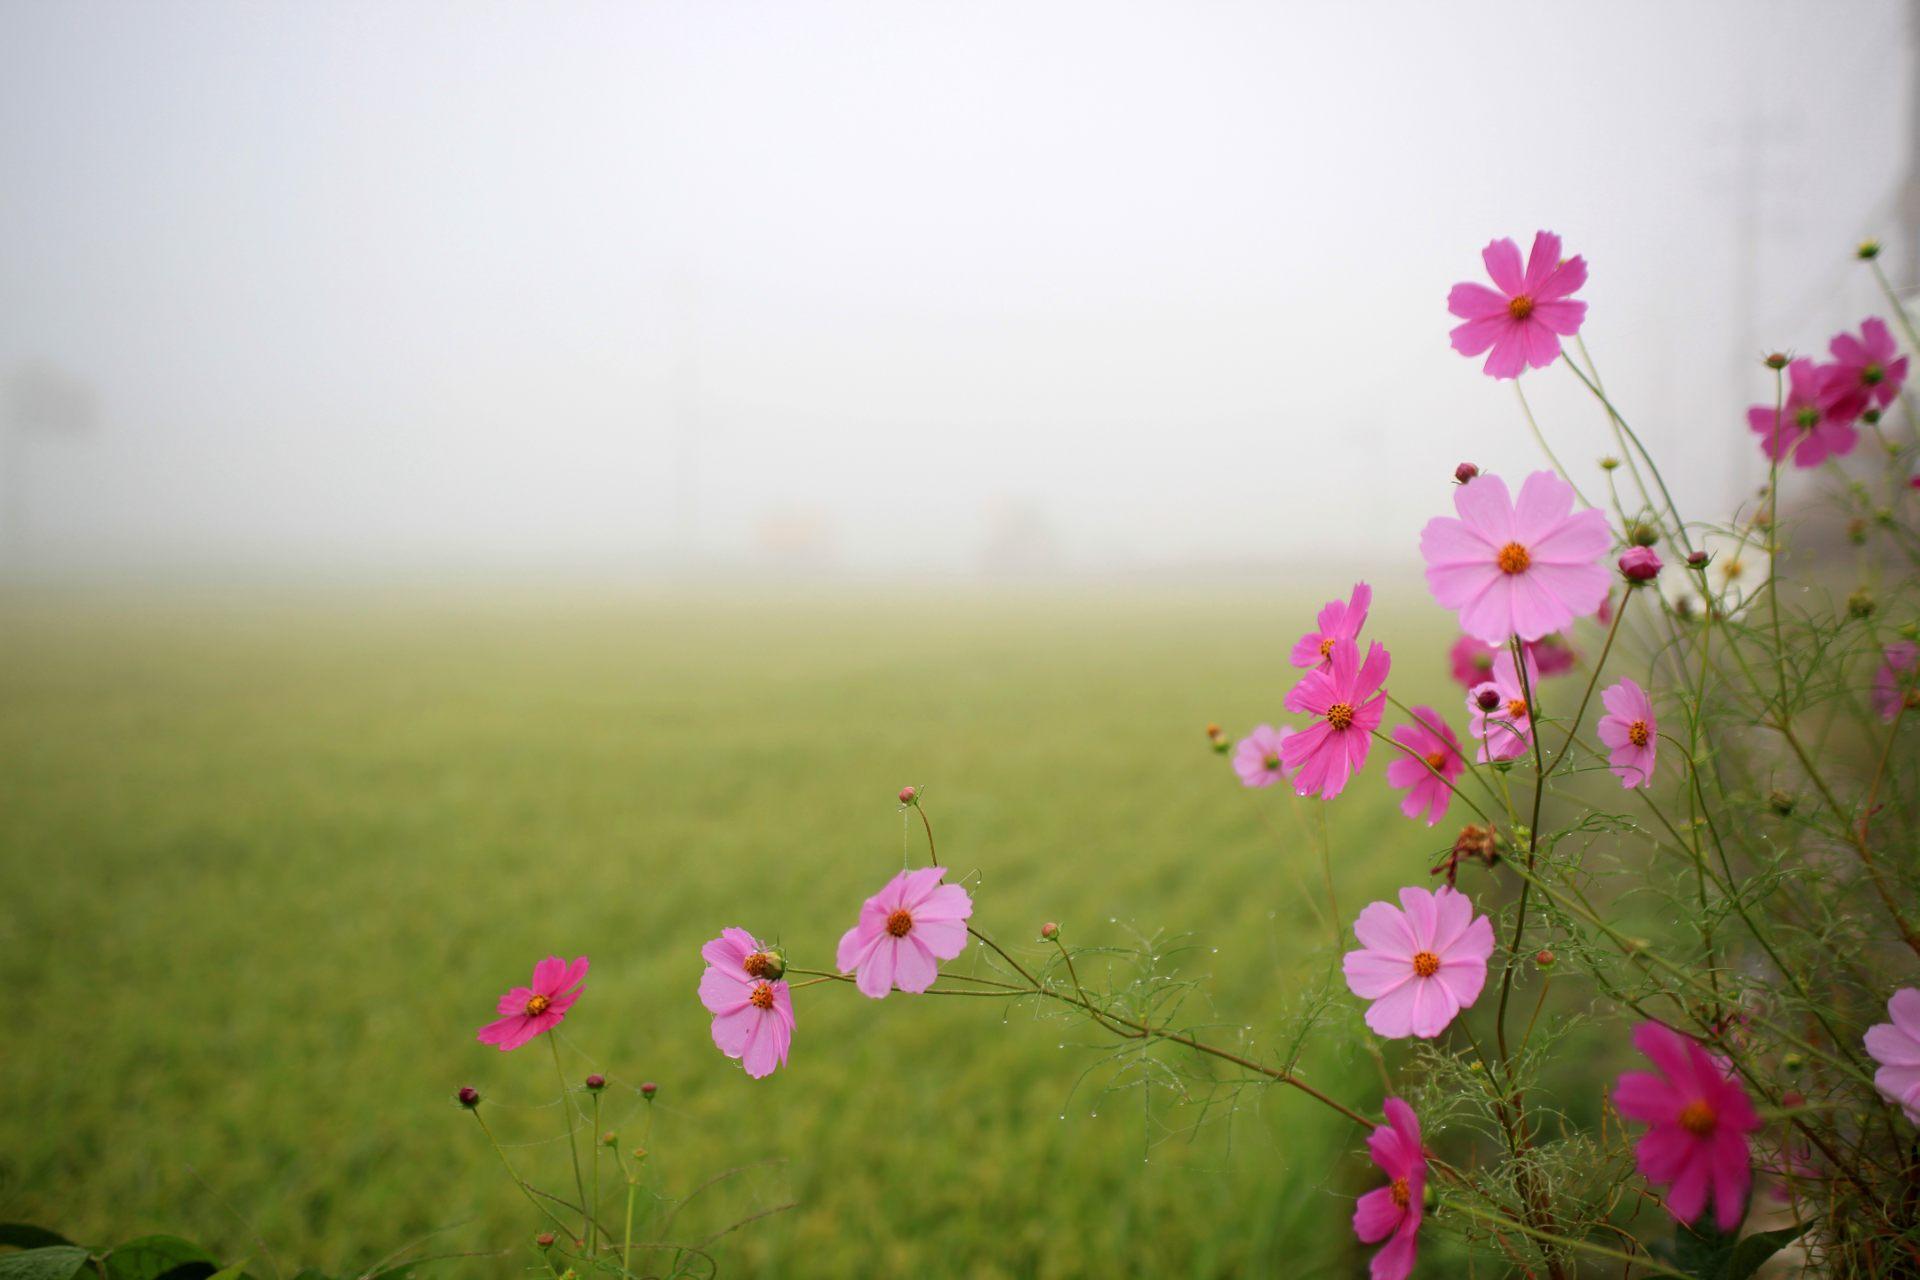 Flower Nature Flower Good Morning Wallpaper Hd